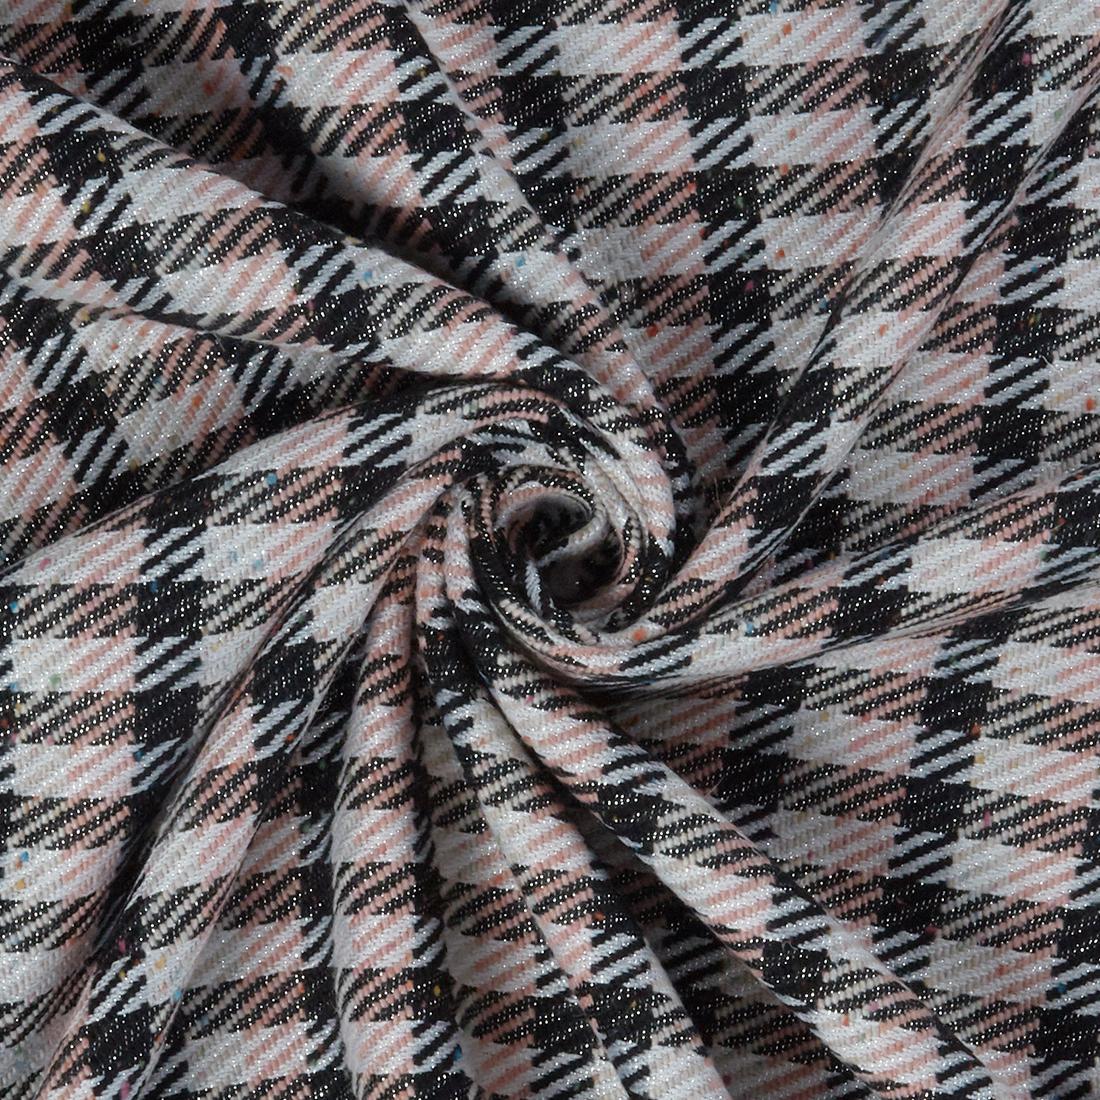 Flecked Check Tweed Pink Black Dress Fabric